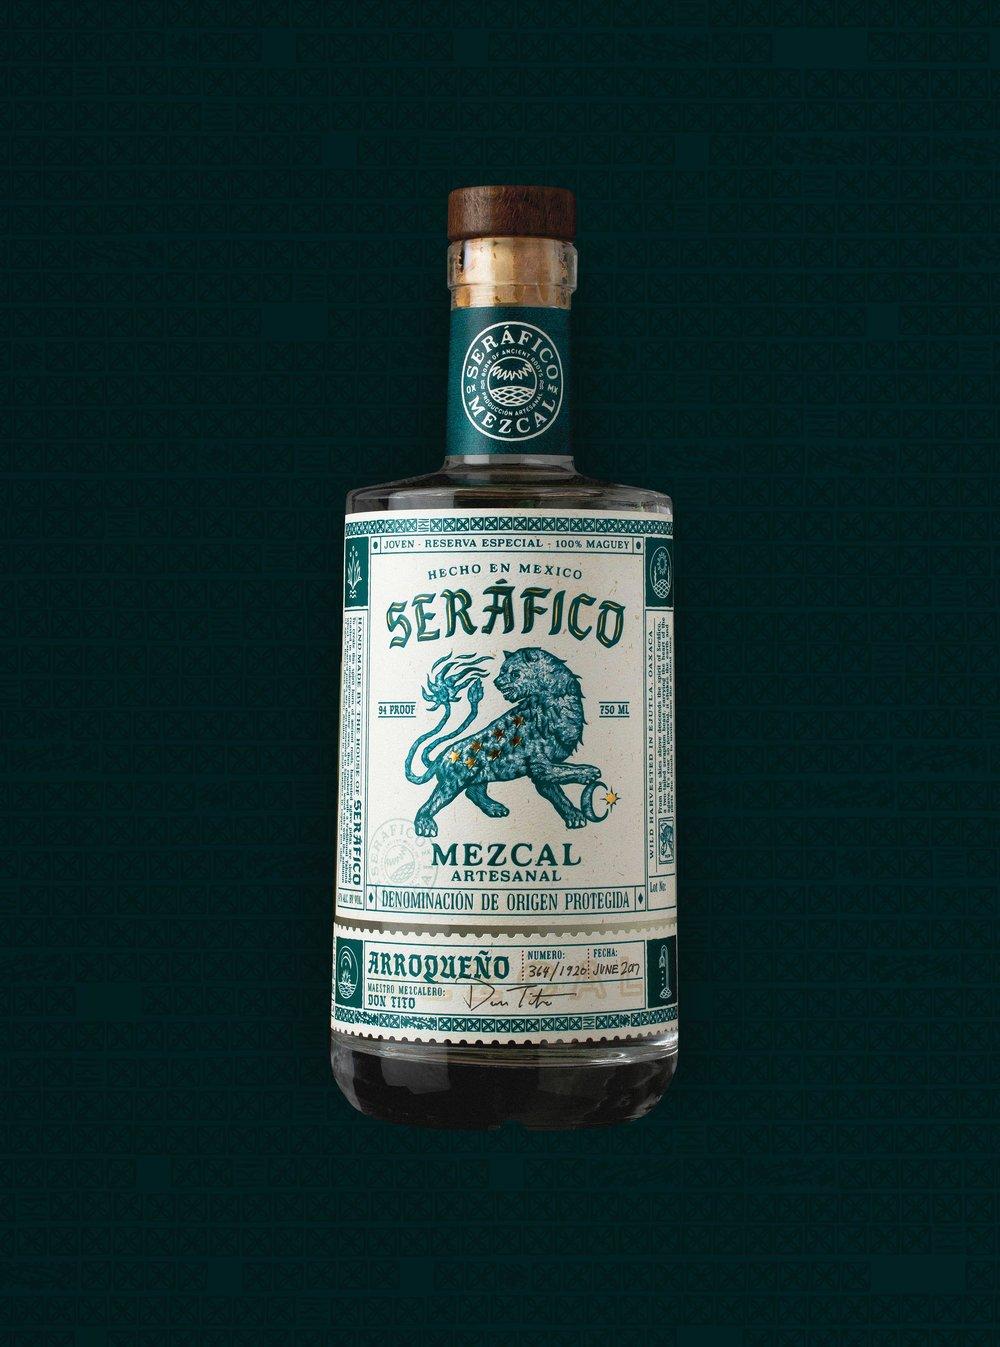 serafico-arroqueno-bottle.jpg